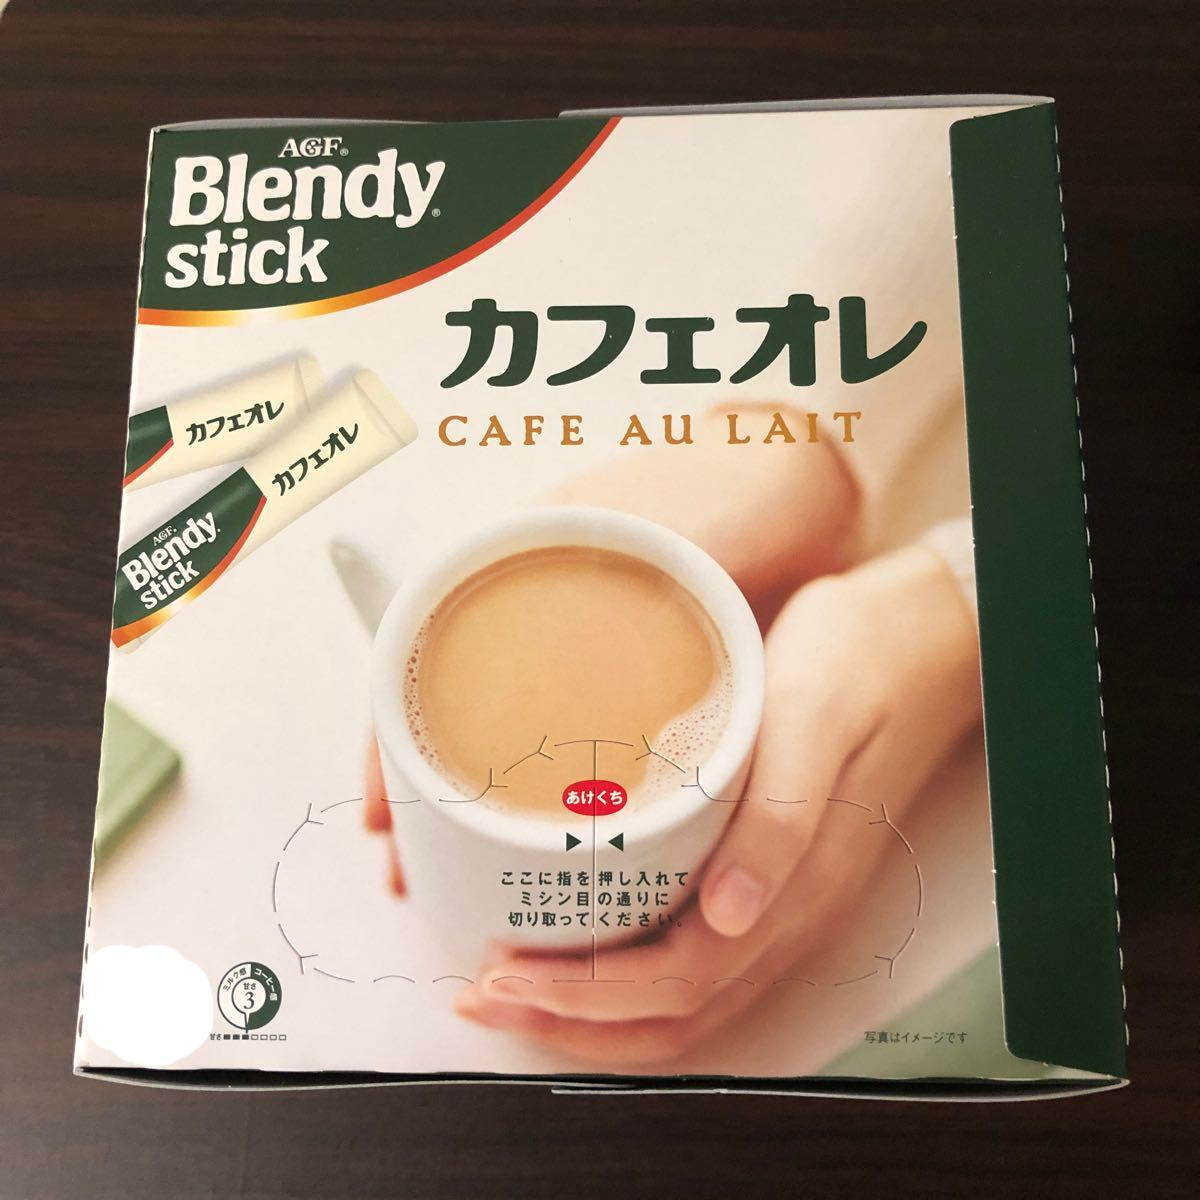 AGF ブレンディスティック カフェオレ50本